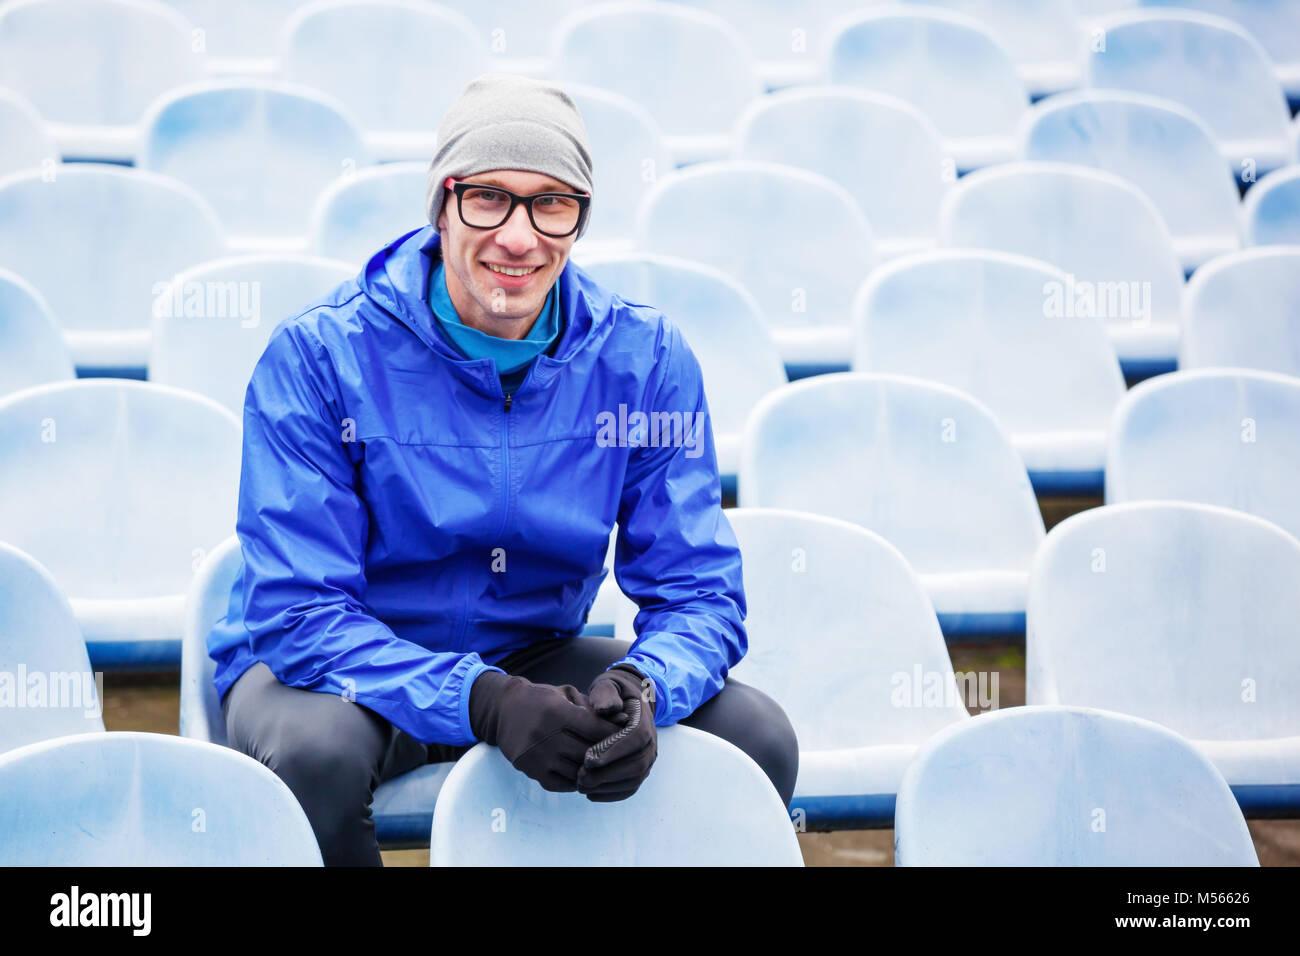 Portrait of professional athlete looking at camera sitting on stadium seat. - Stock Image